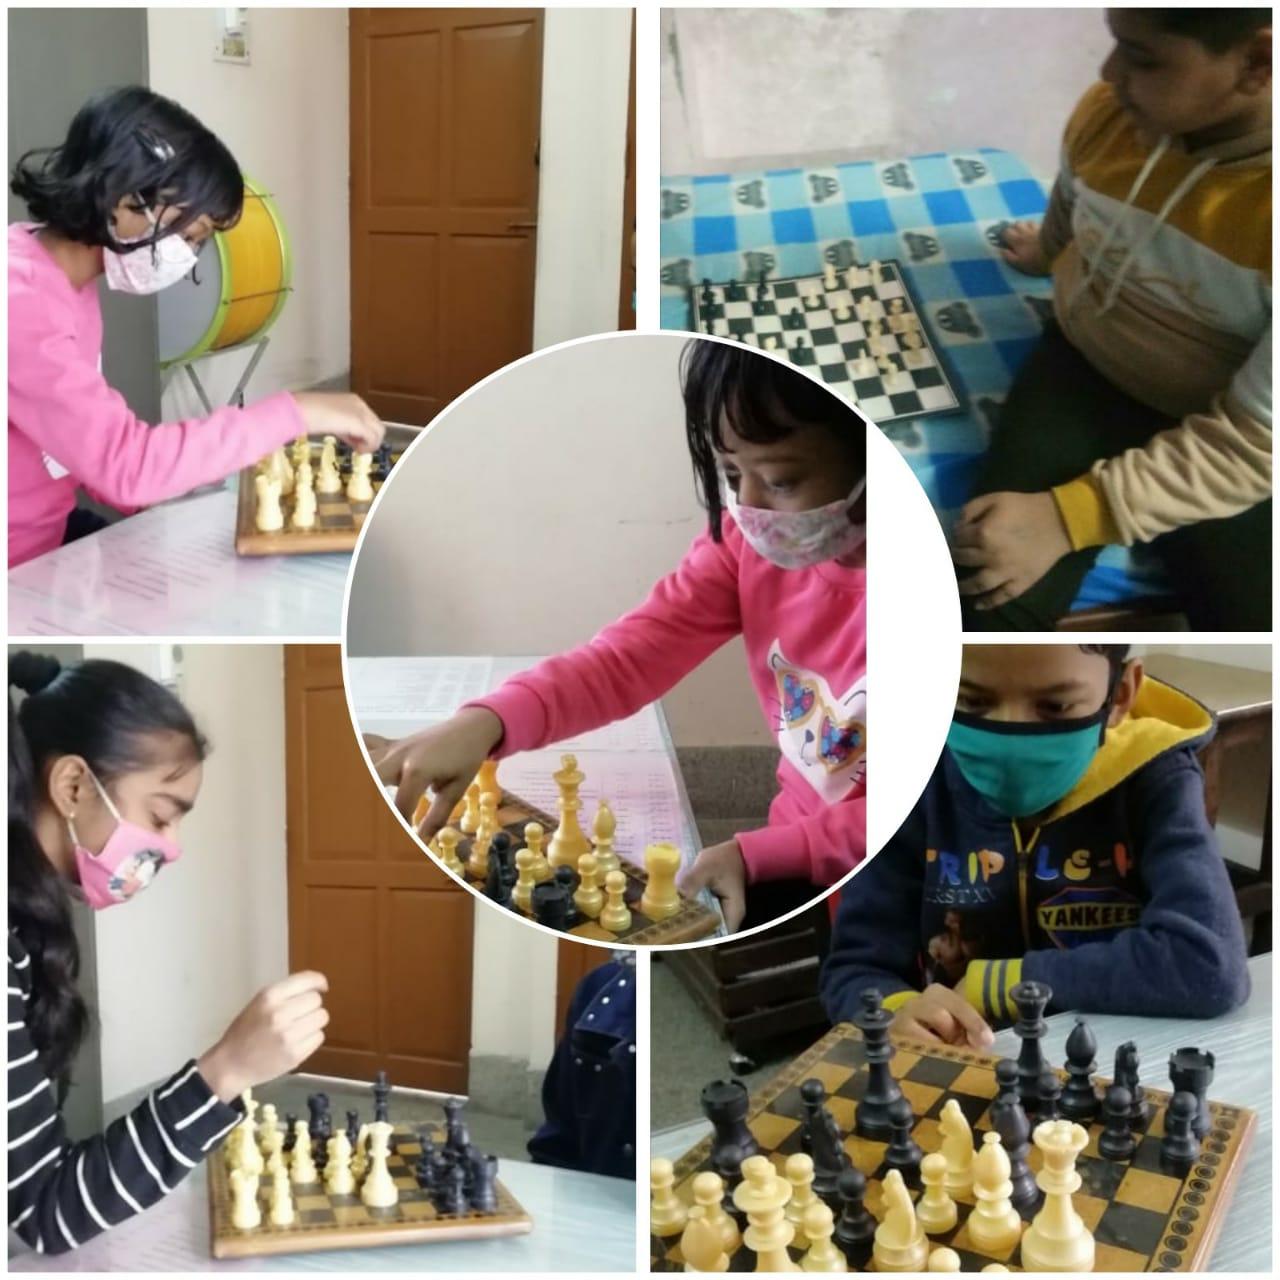 Mind gamnes- Chess & Cubes 1